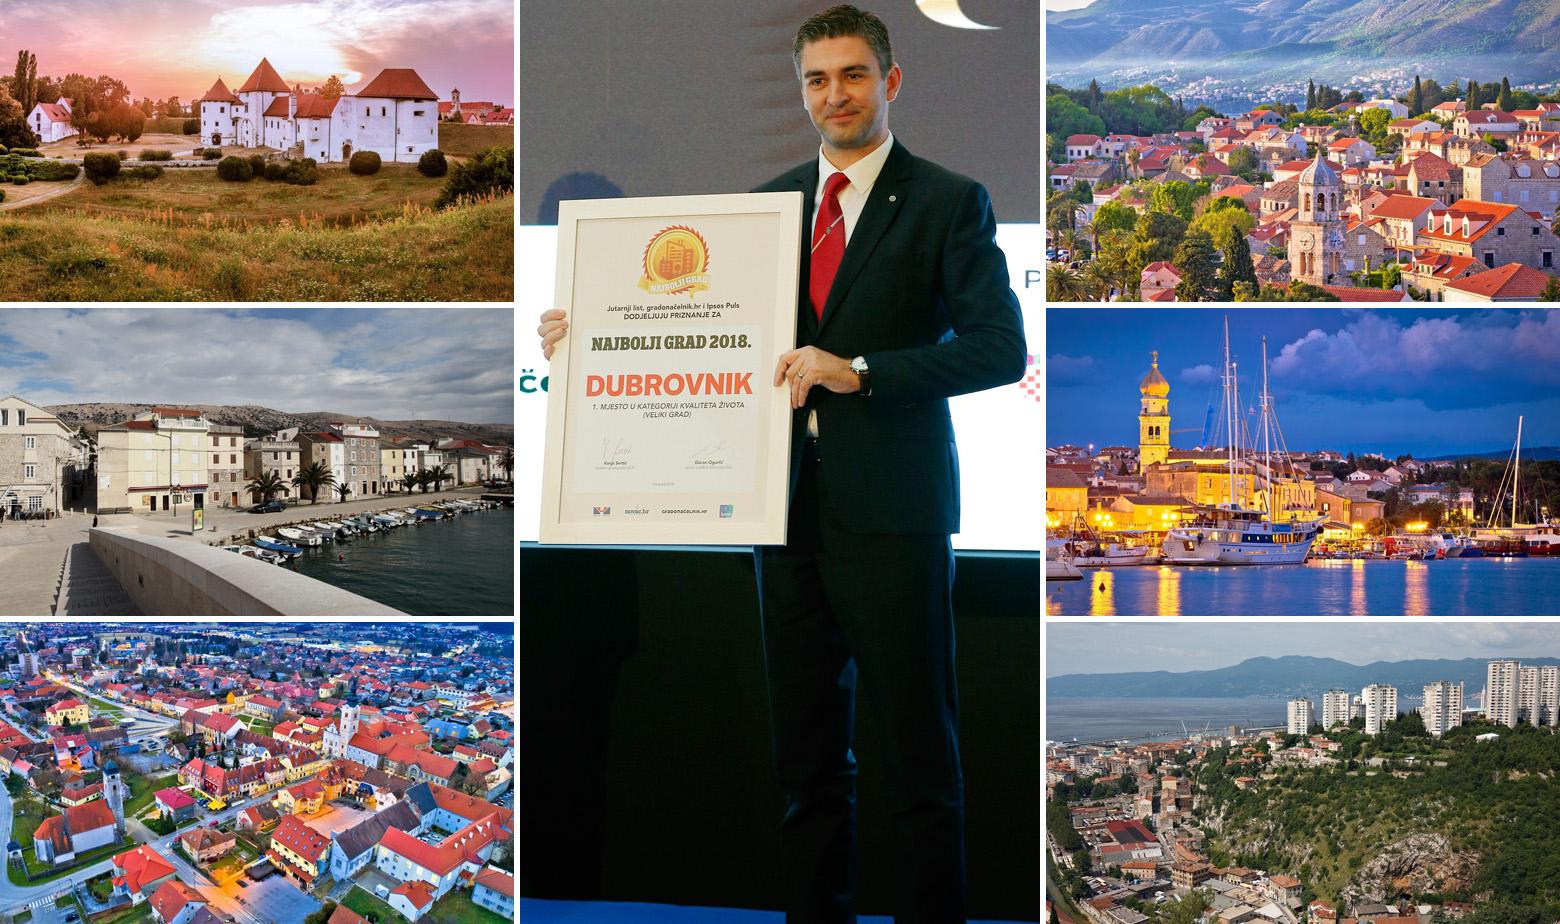 Na fotografiji: Varaždin, Pag, Križevci / Gradonačelnik Dubrovnika Mato Franković s nagradom / Dubrovnik, Krk i Rijeka